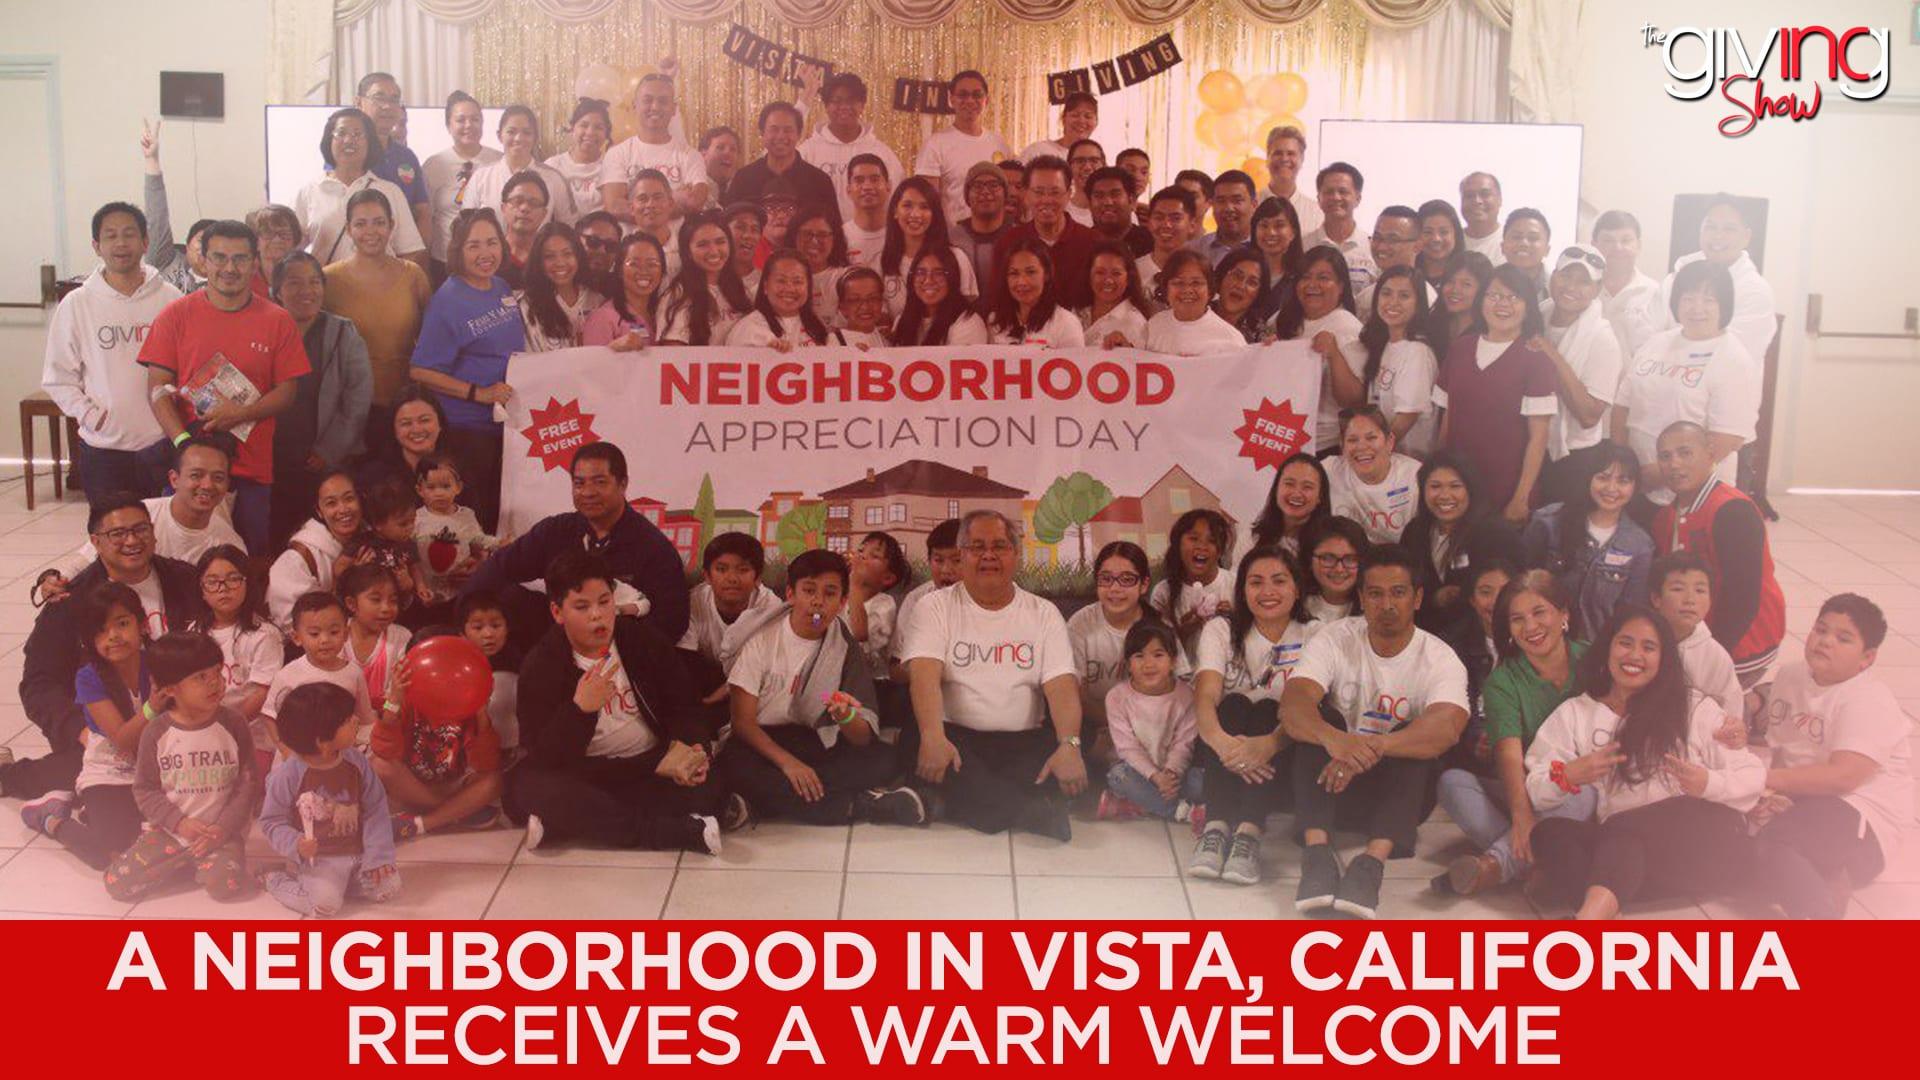 A Neighborhood in Vista, California Receives a Warm Welcome